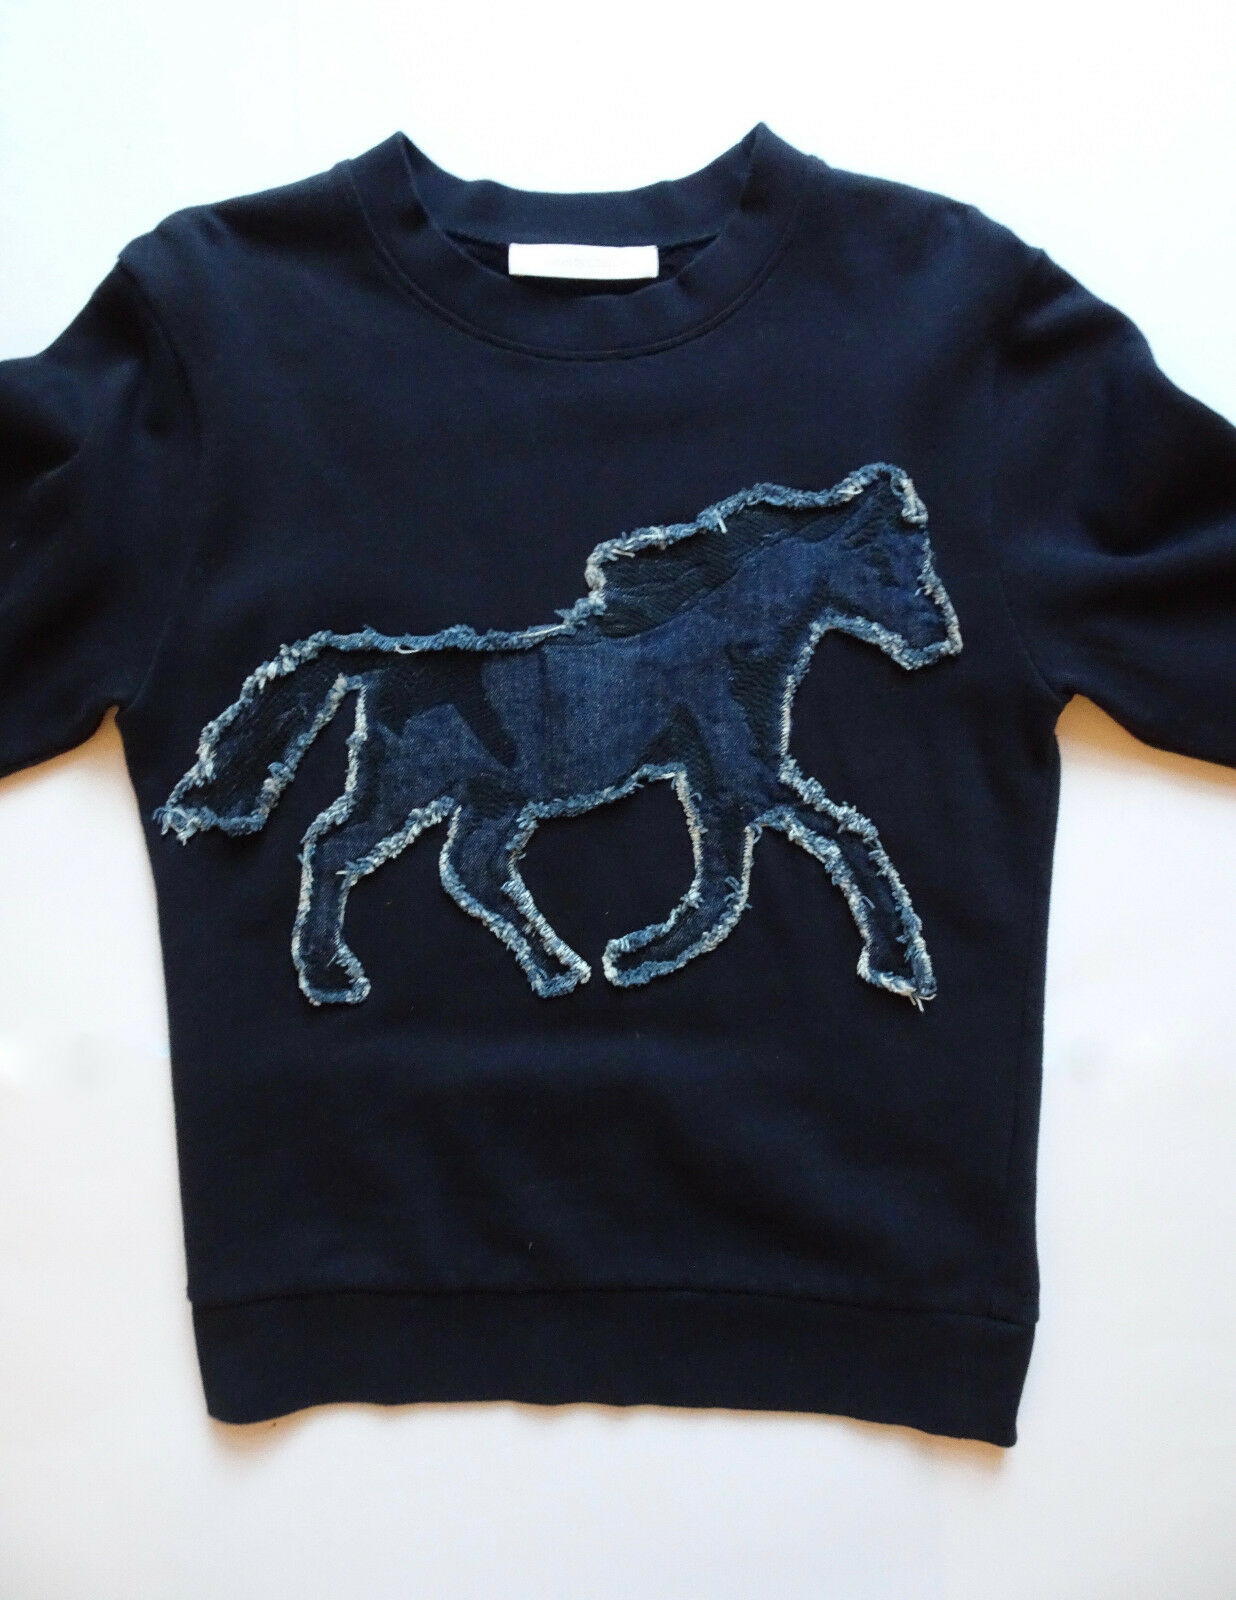 AUTH SEE BY CHLOE SWEATSHIRT DARK NAVY 36 S HORSE SWEATER EXTRA LONG SLEEVES